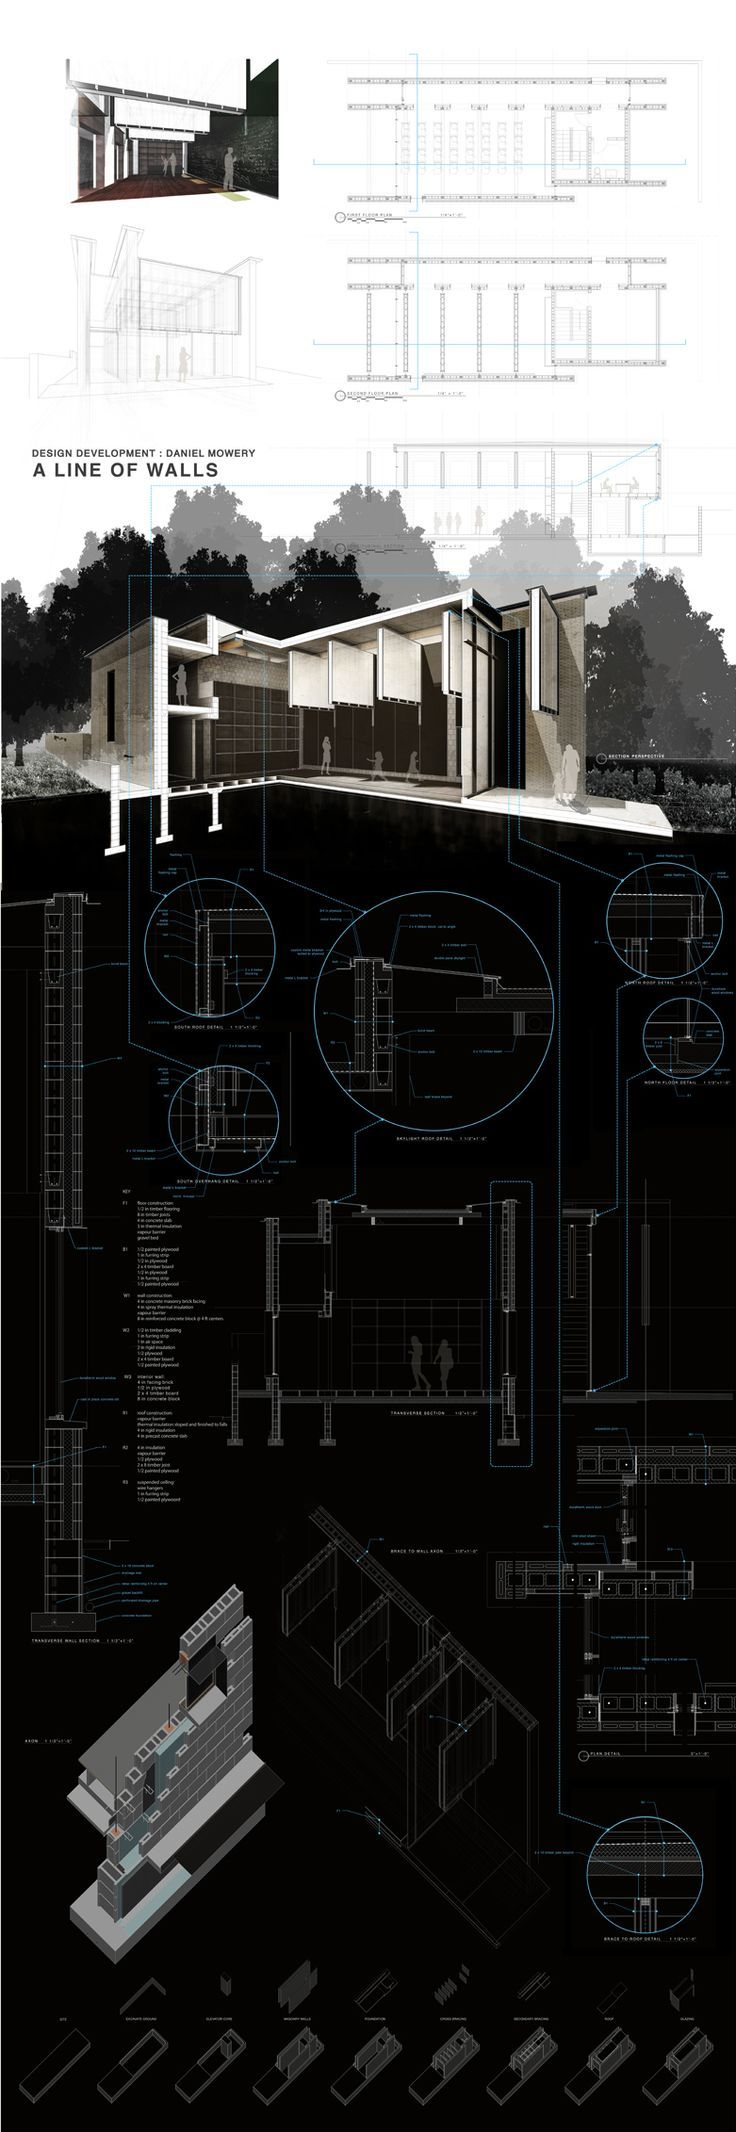 Daniel Mowery / Design Development / A LINE OF WALLS: